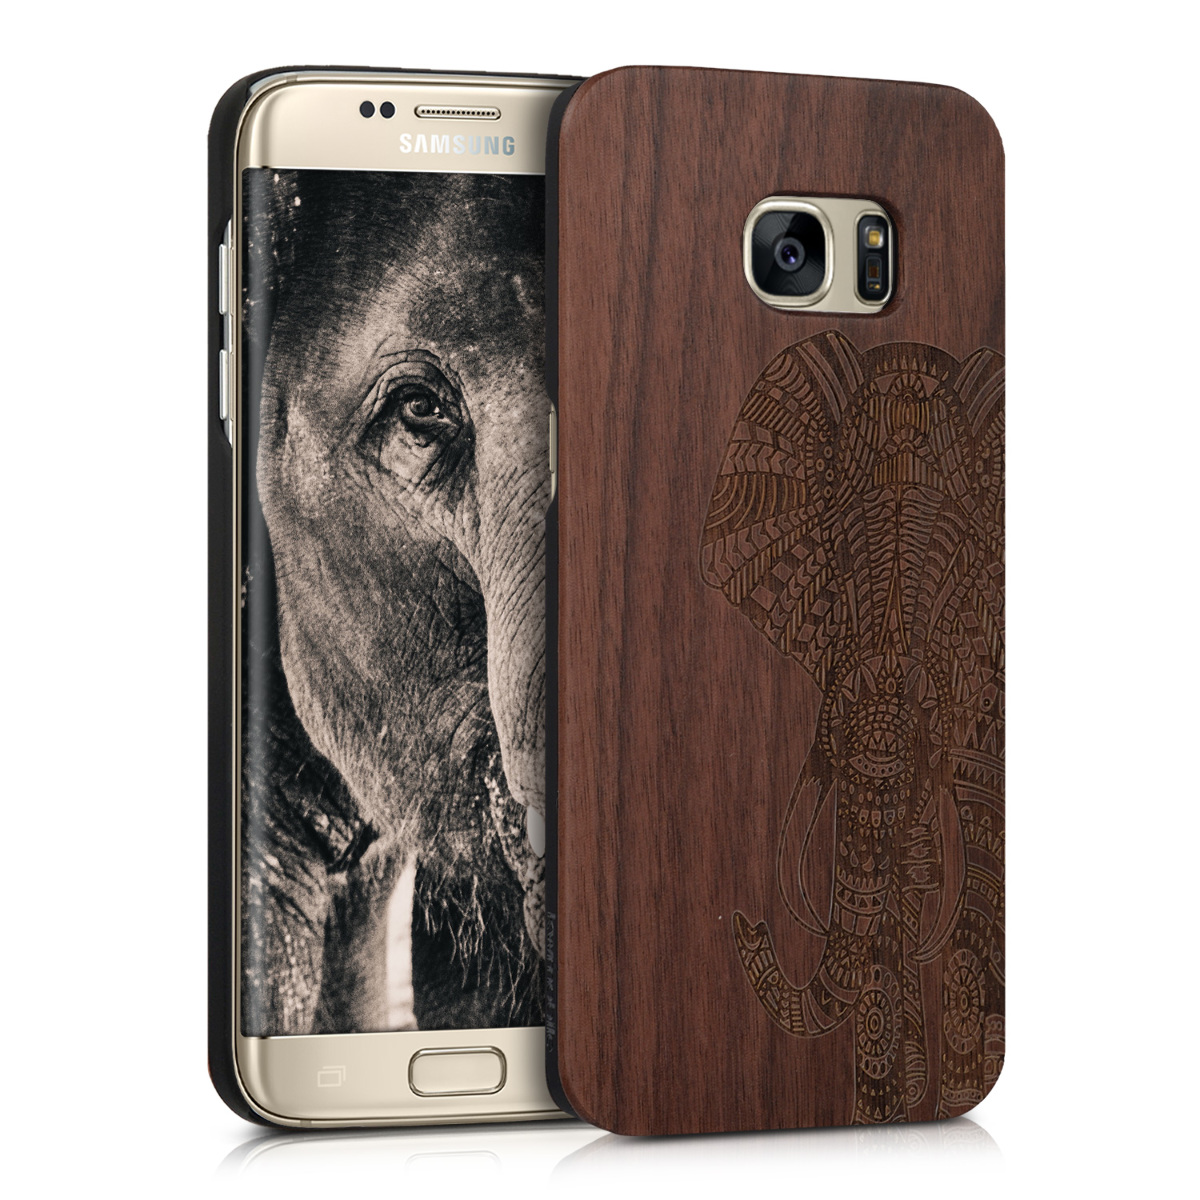 KW Ξύλινη Θήκη Samsung Galaxy S7 Edge - Brown - Elephant  (39560.03)